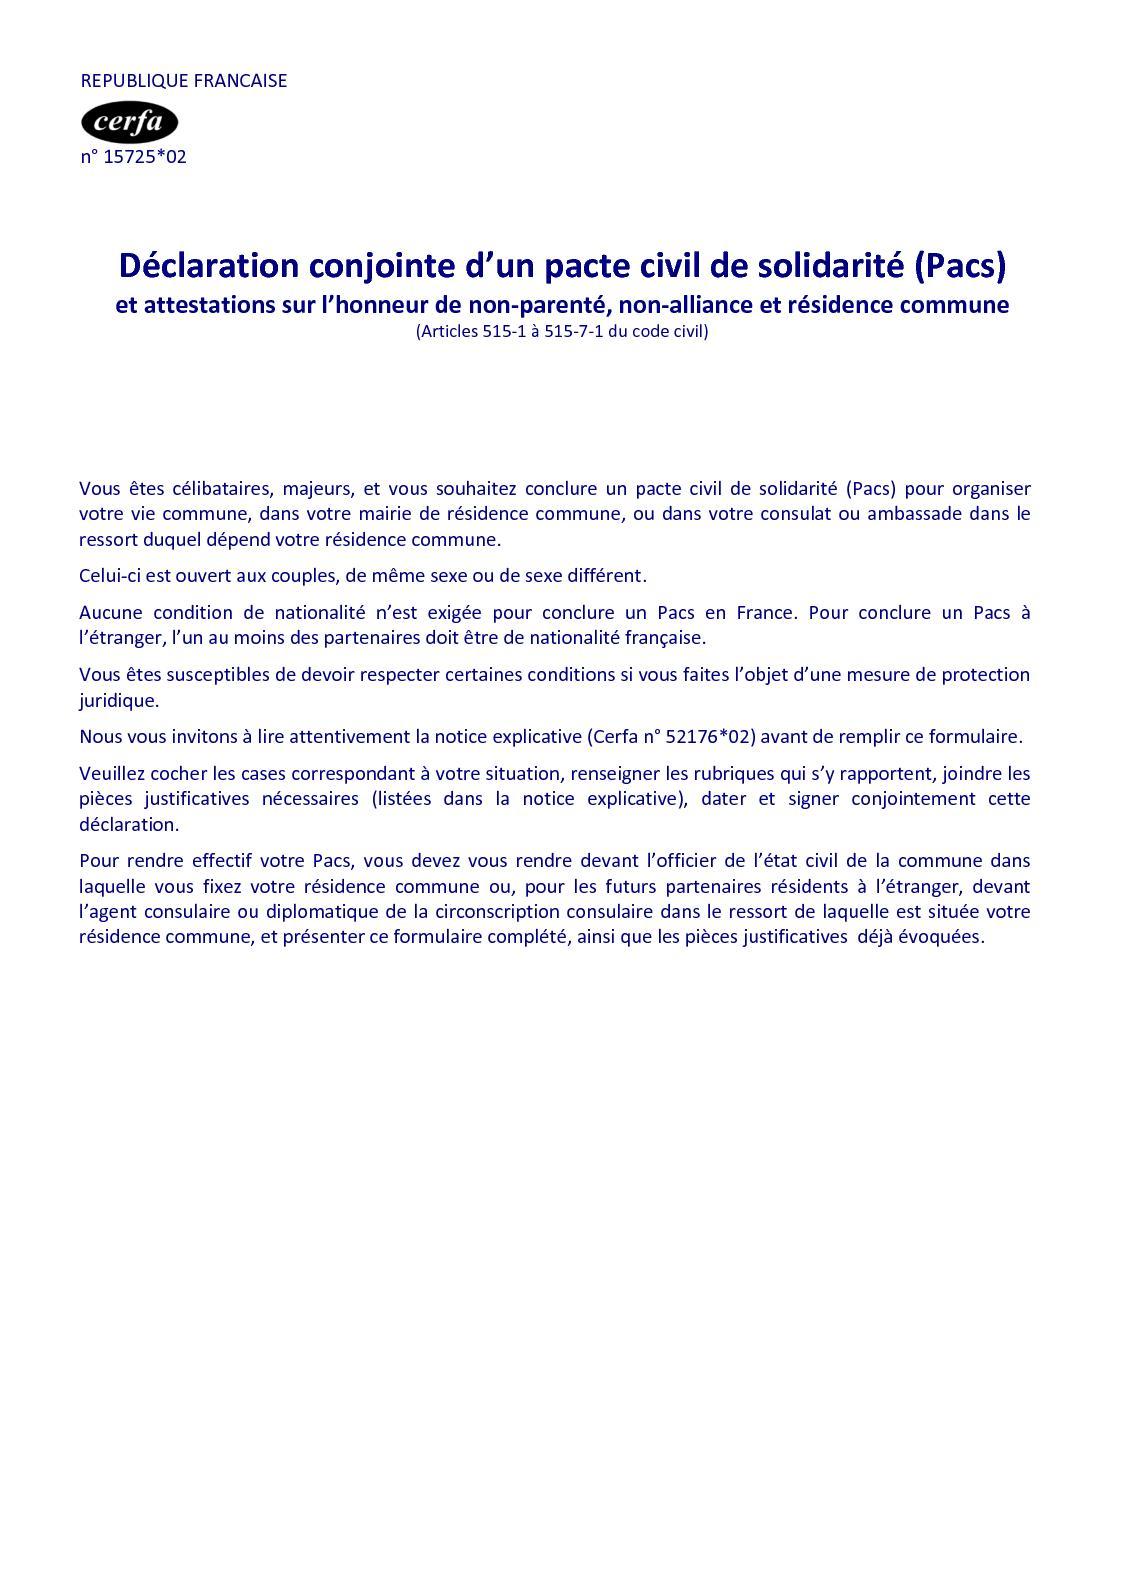 Calameo Declaration Conjointe Pacs 15725